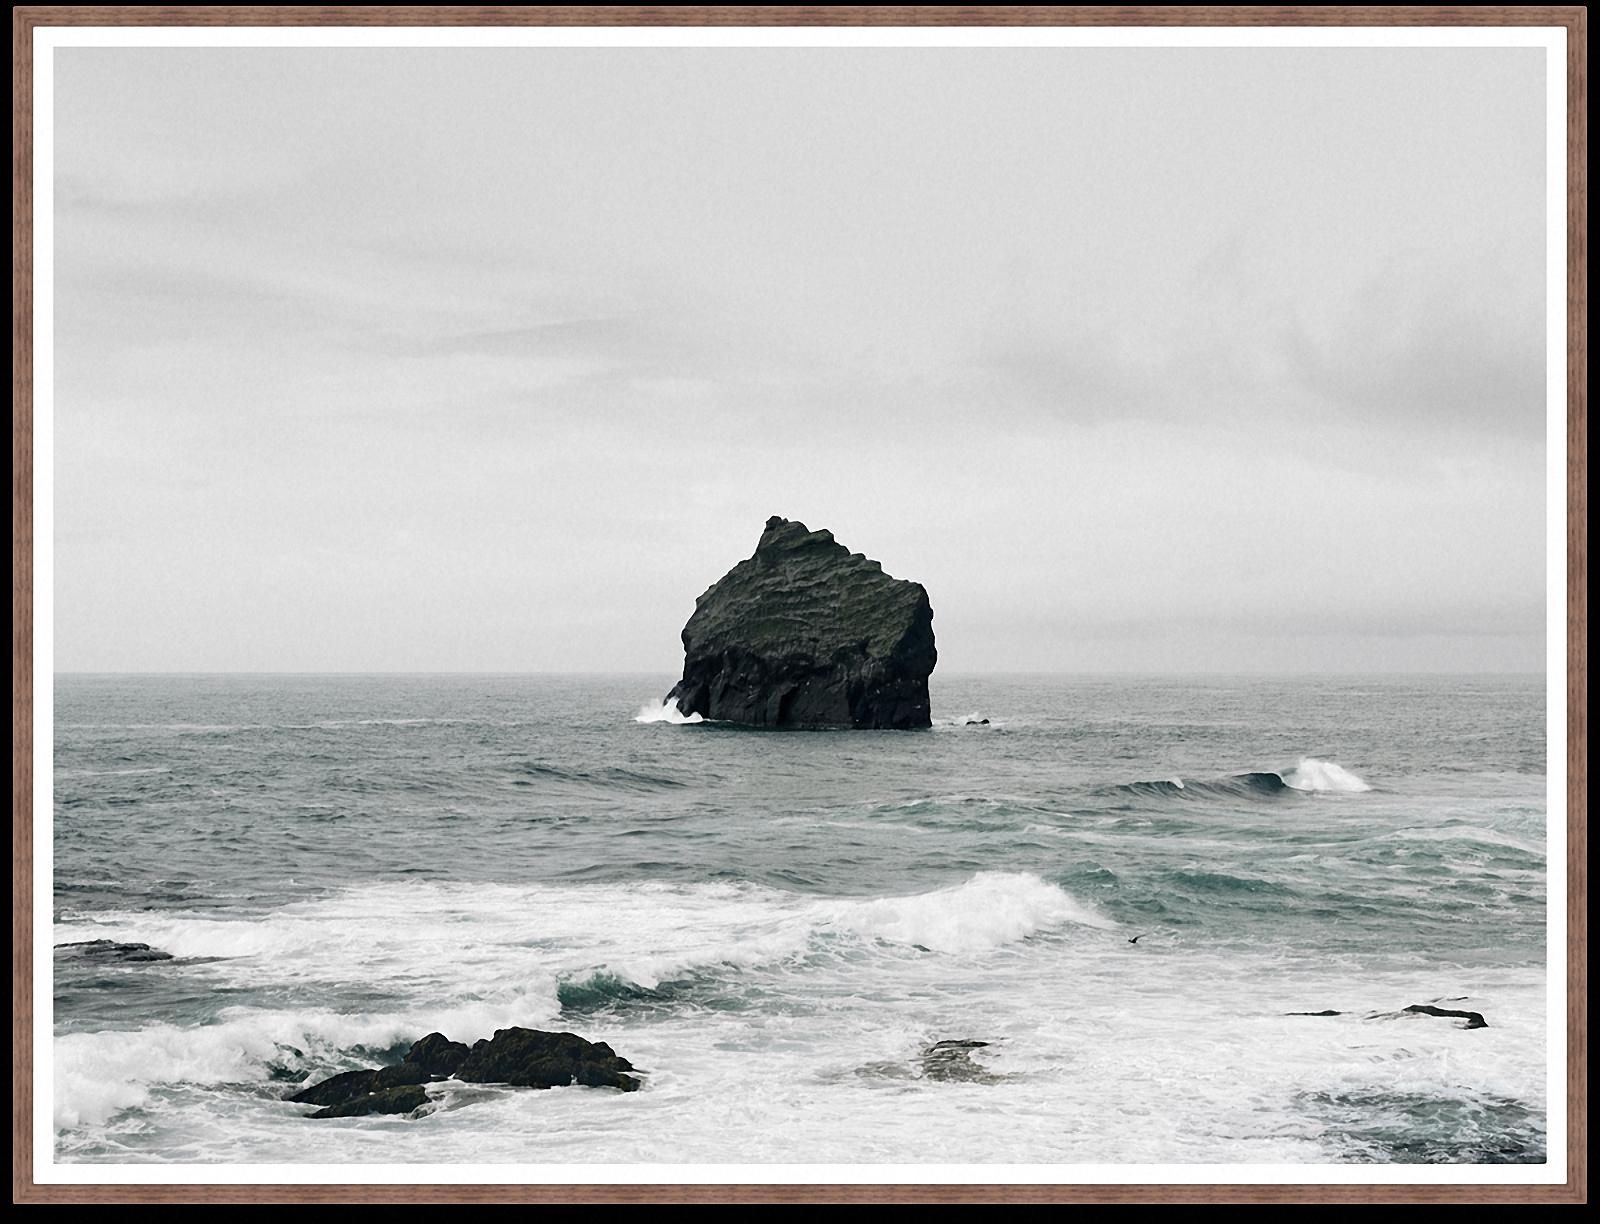 Grossformatfoto Brim Iceland X Kunstfotografie Robert Kopecky Fotograf